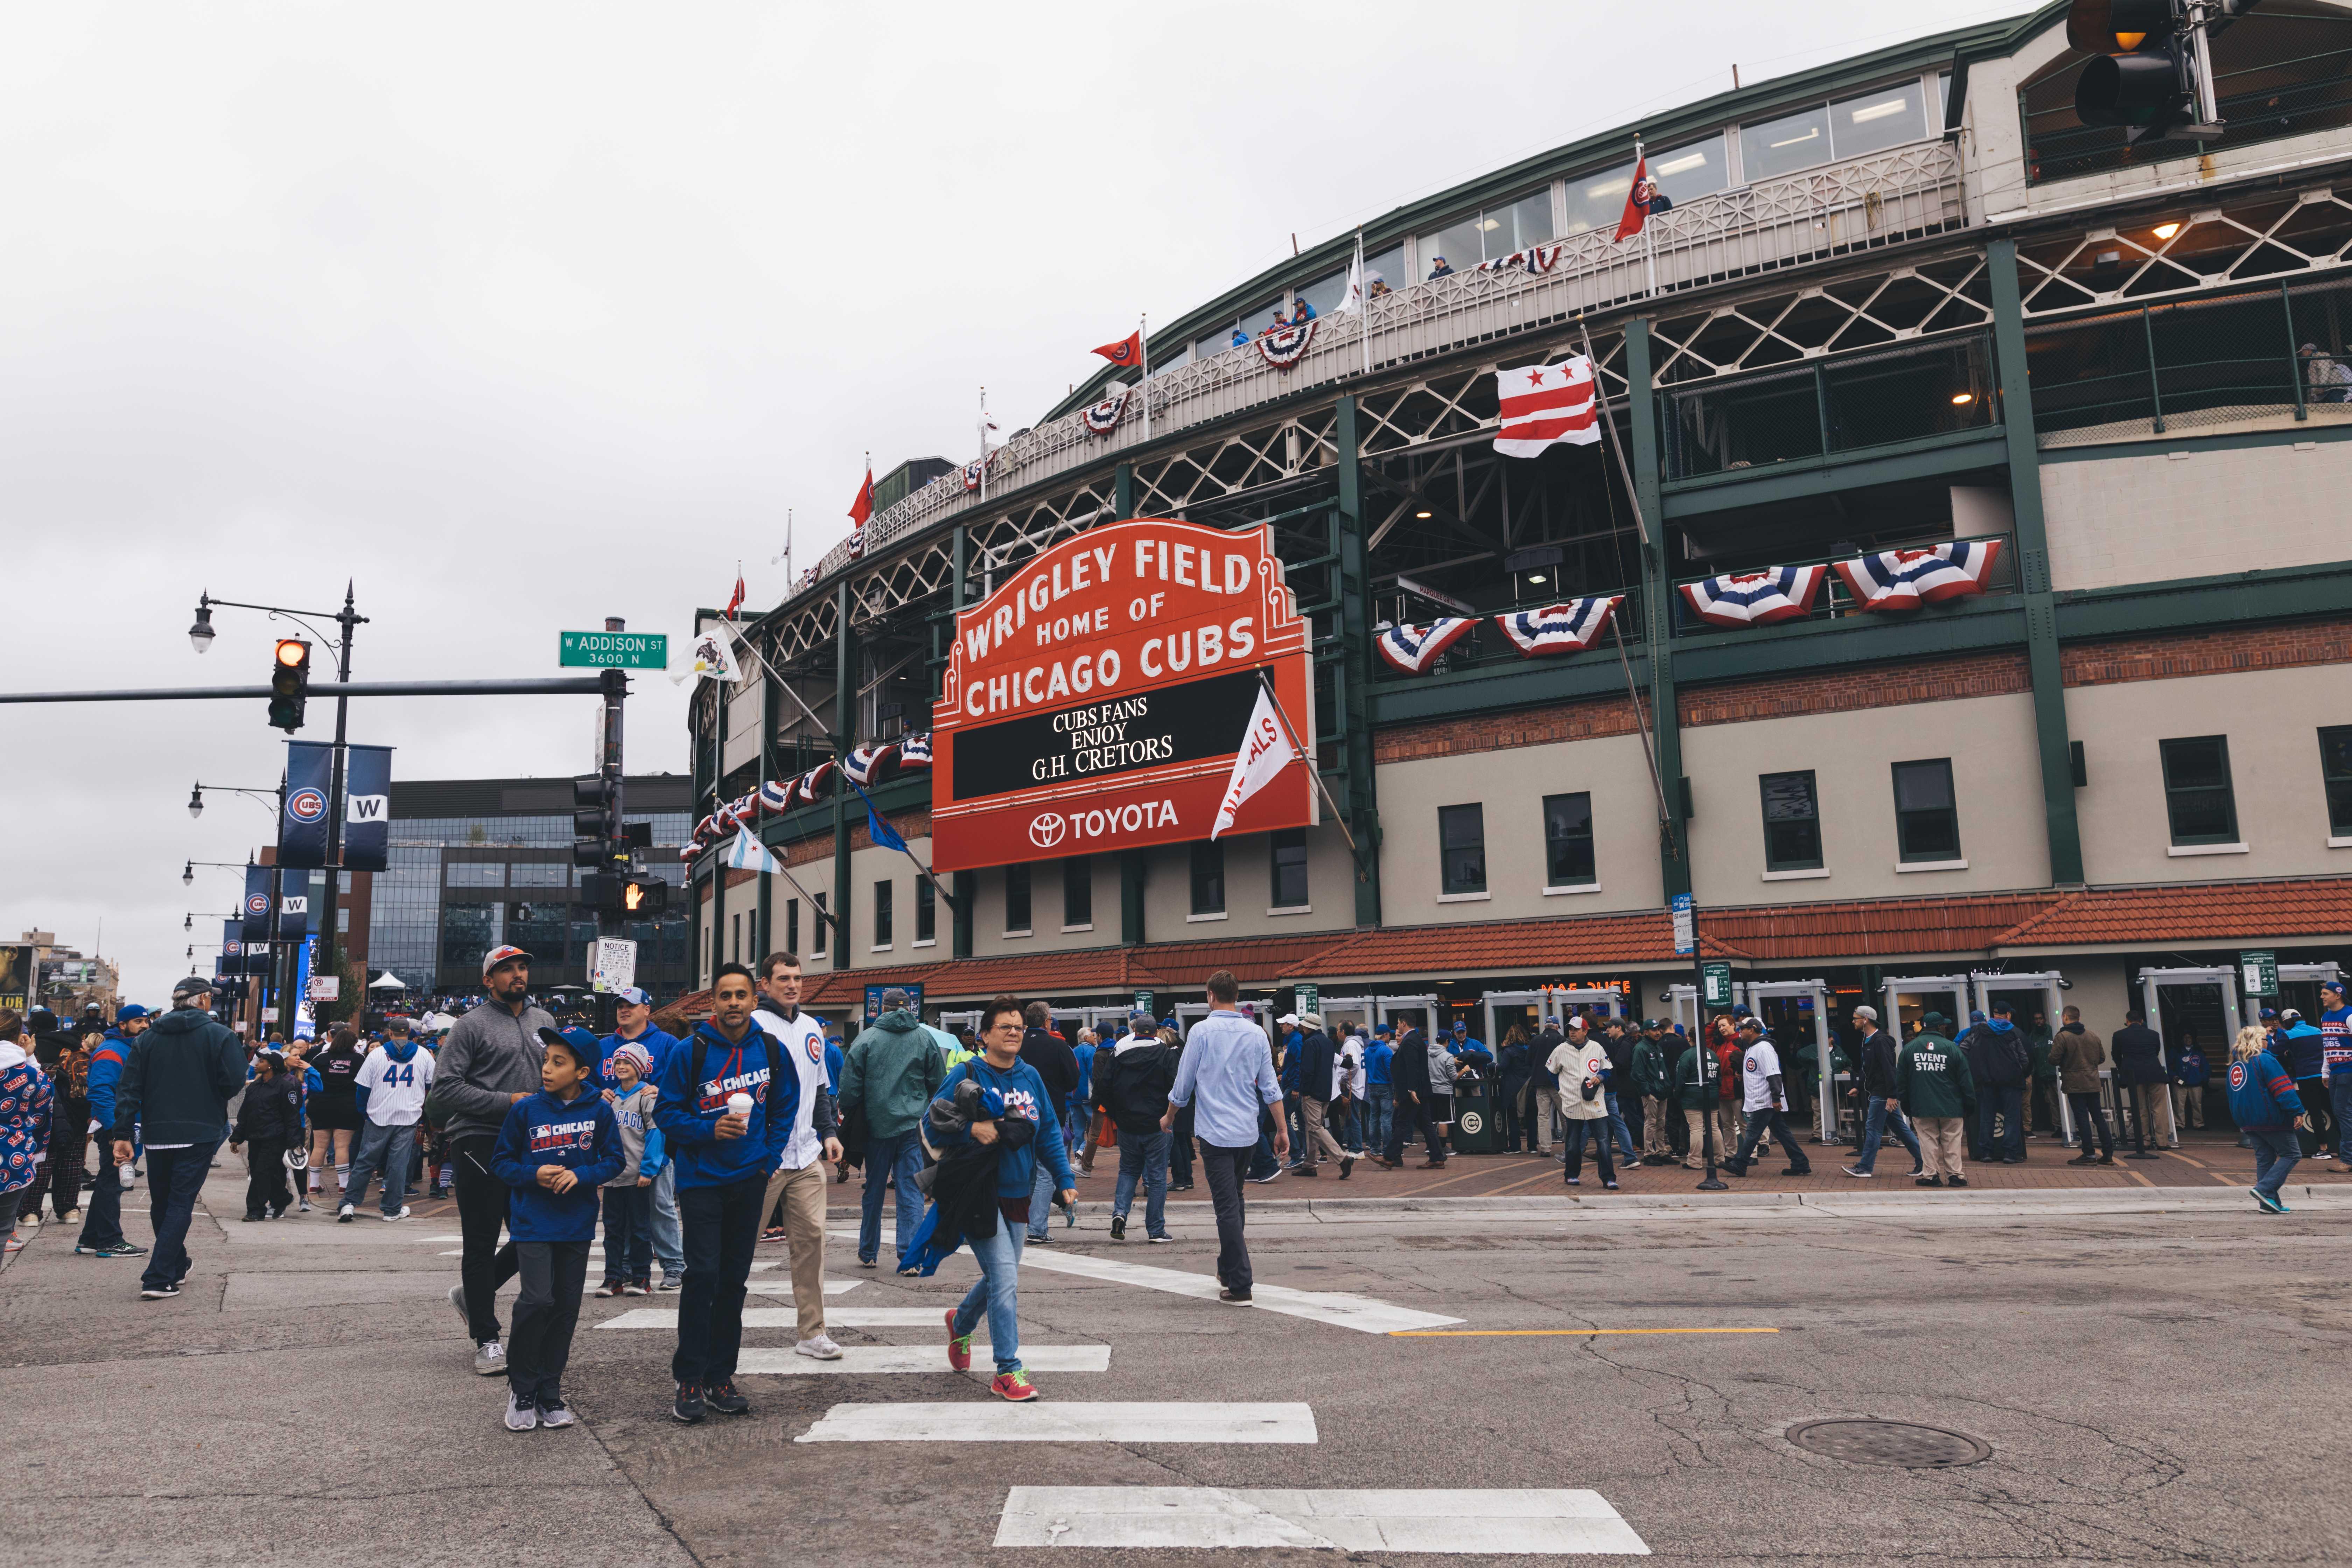 Fans+walk+across+the+intersection+of+Addison+and+Clark.+%28Josh+Leff%2FThe+DePaulia%29